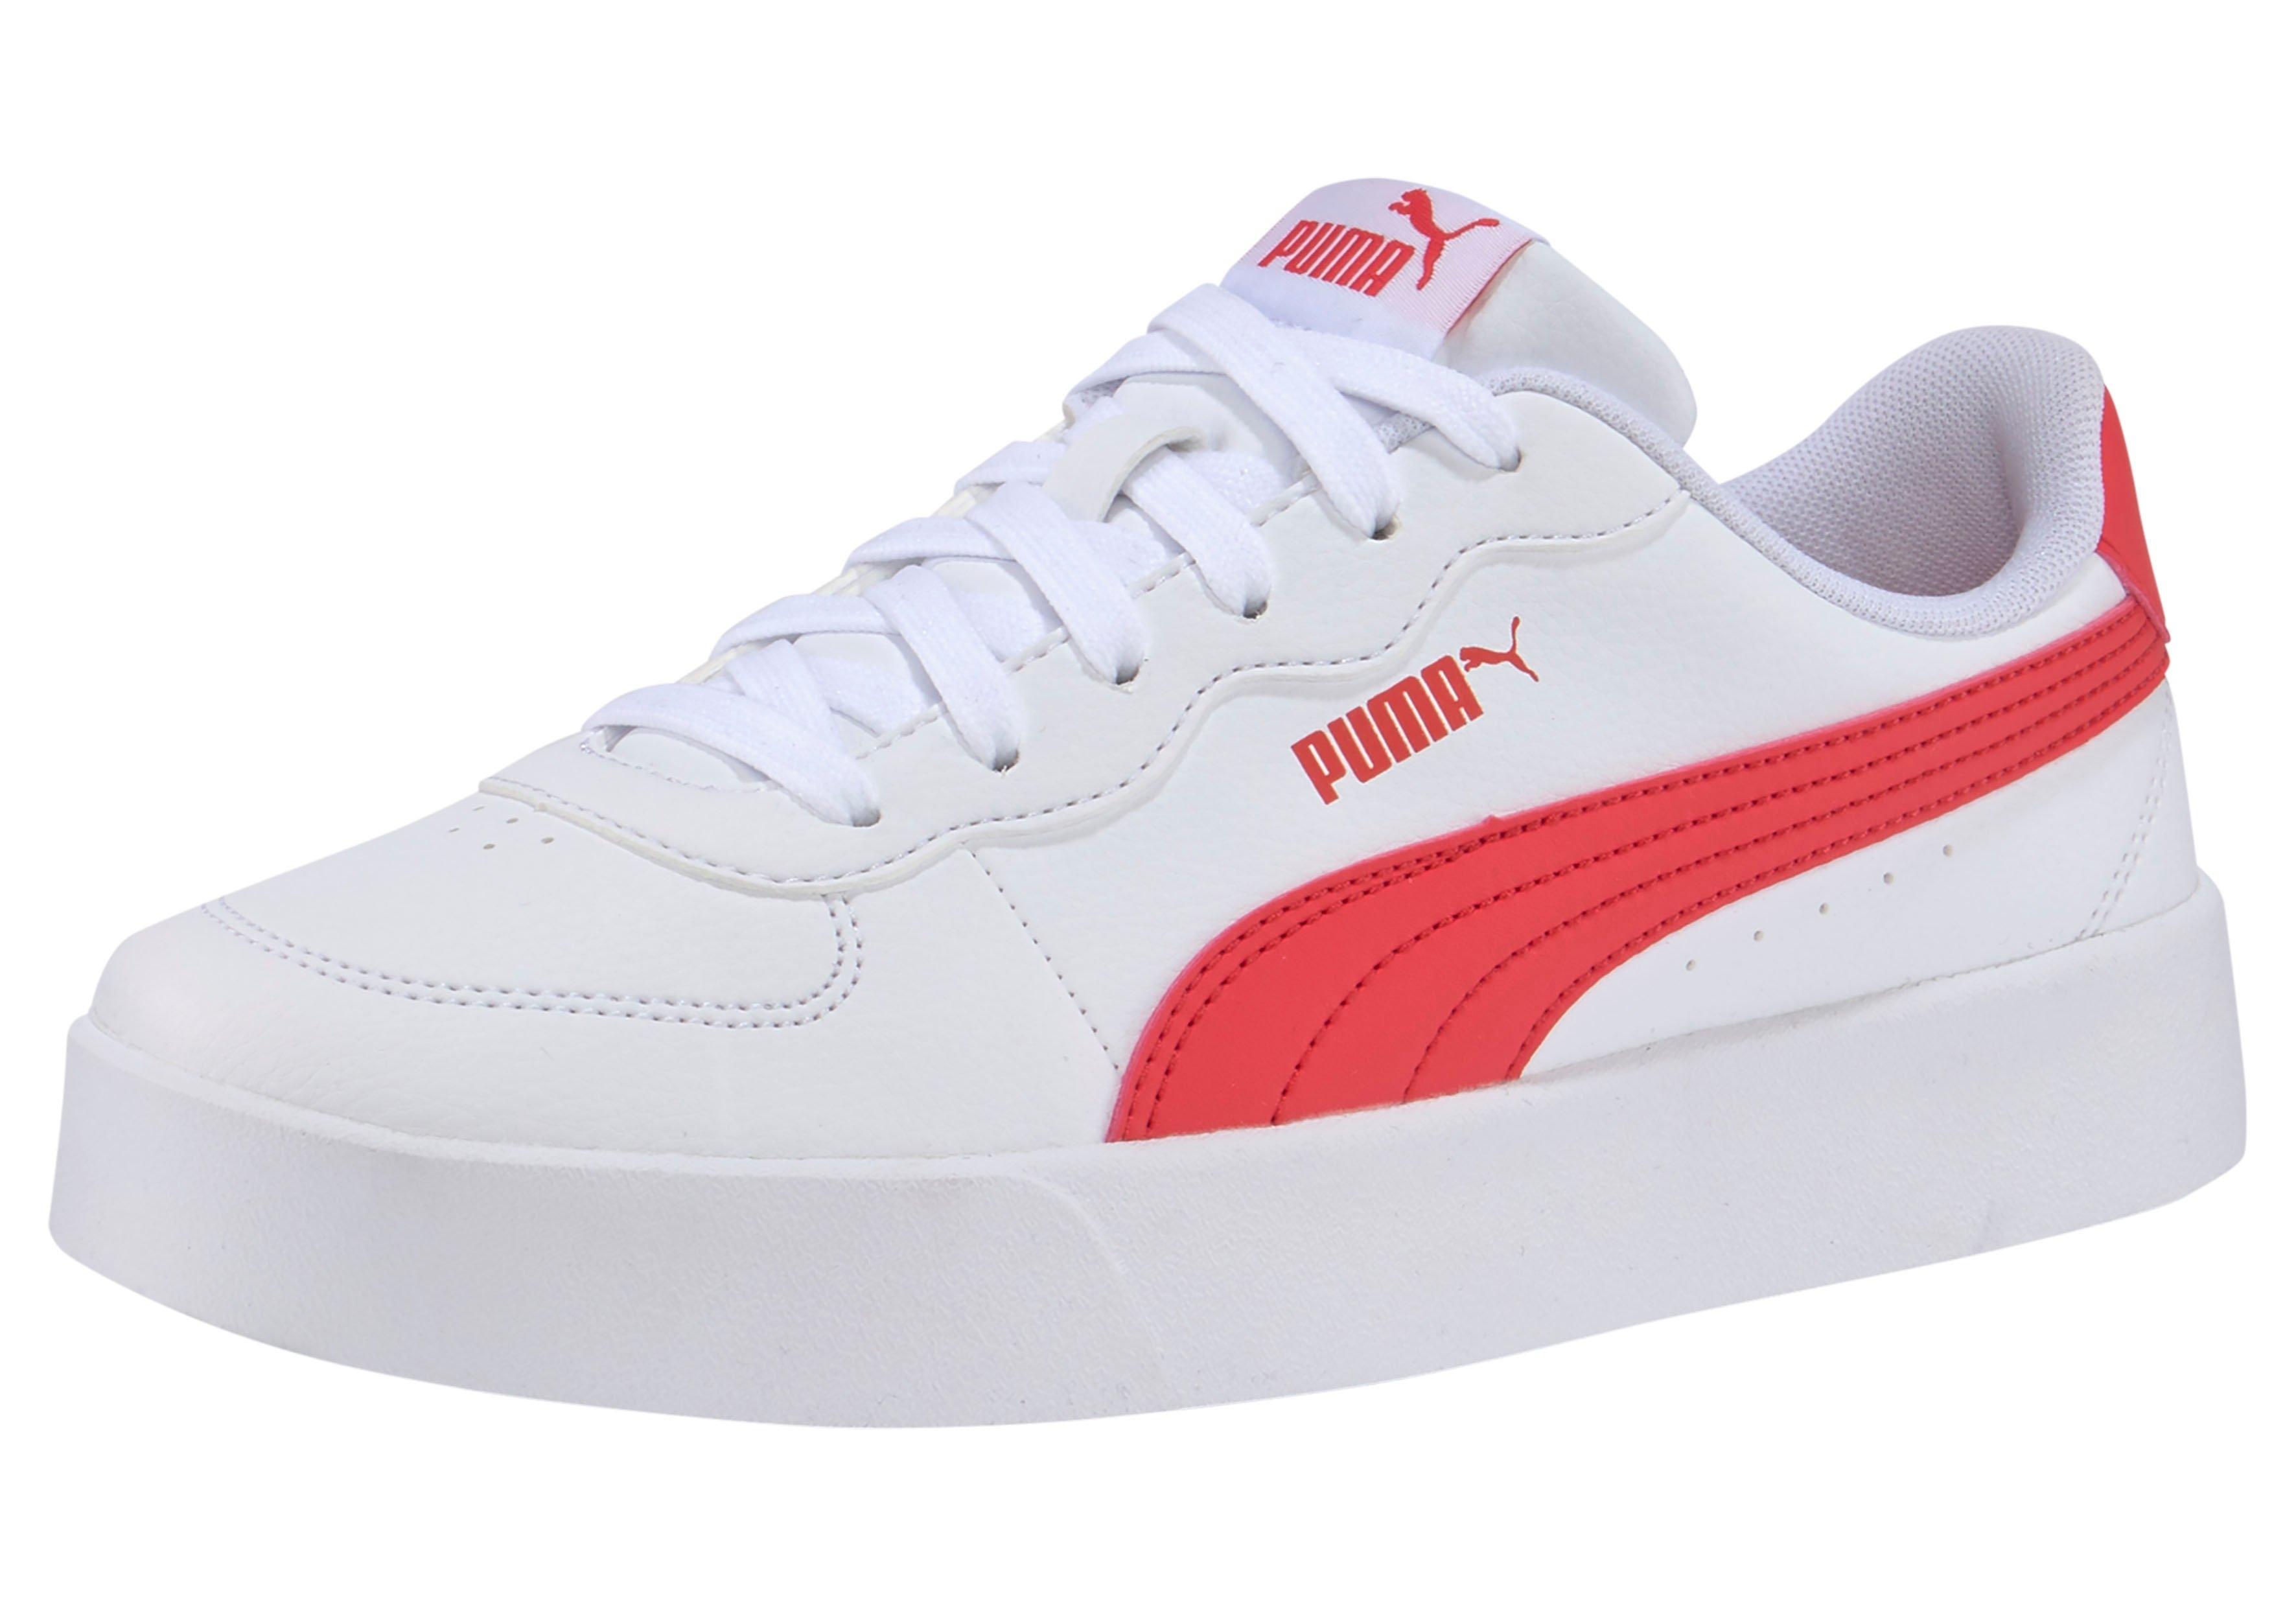 PUMA sneakers Puma Skye Clean voordelig en veilig online kopen